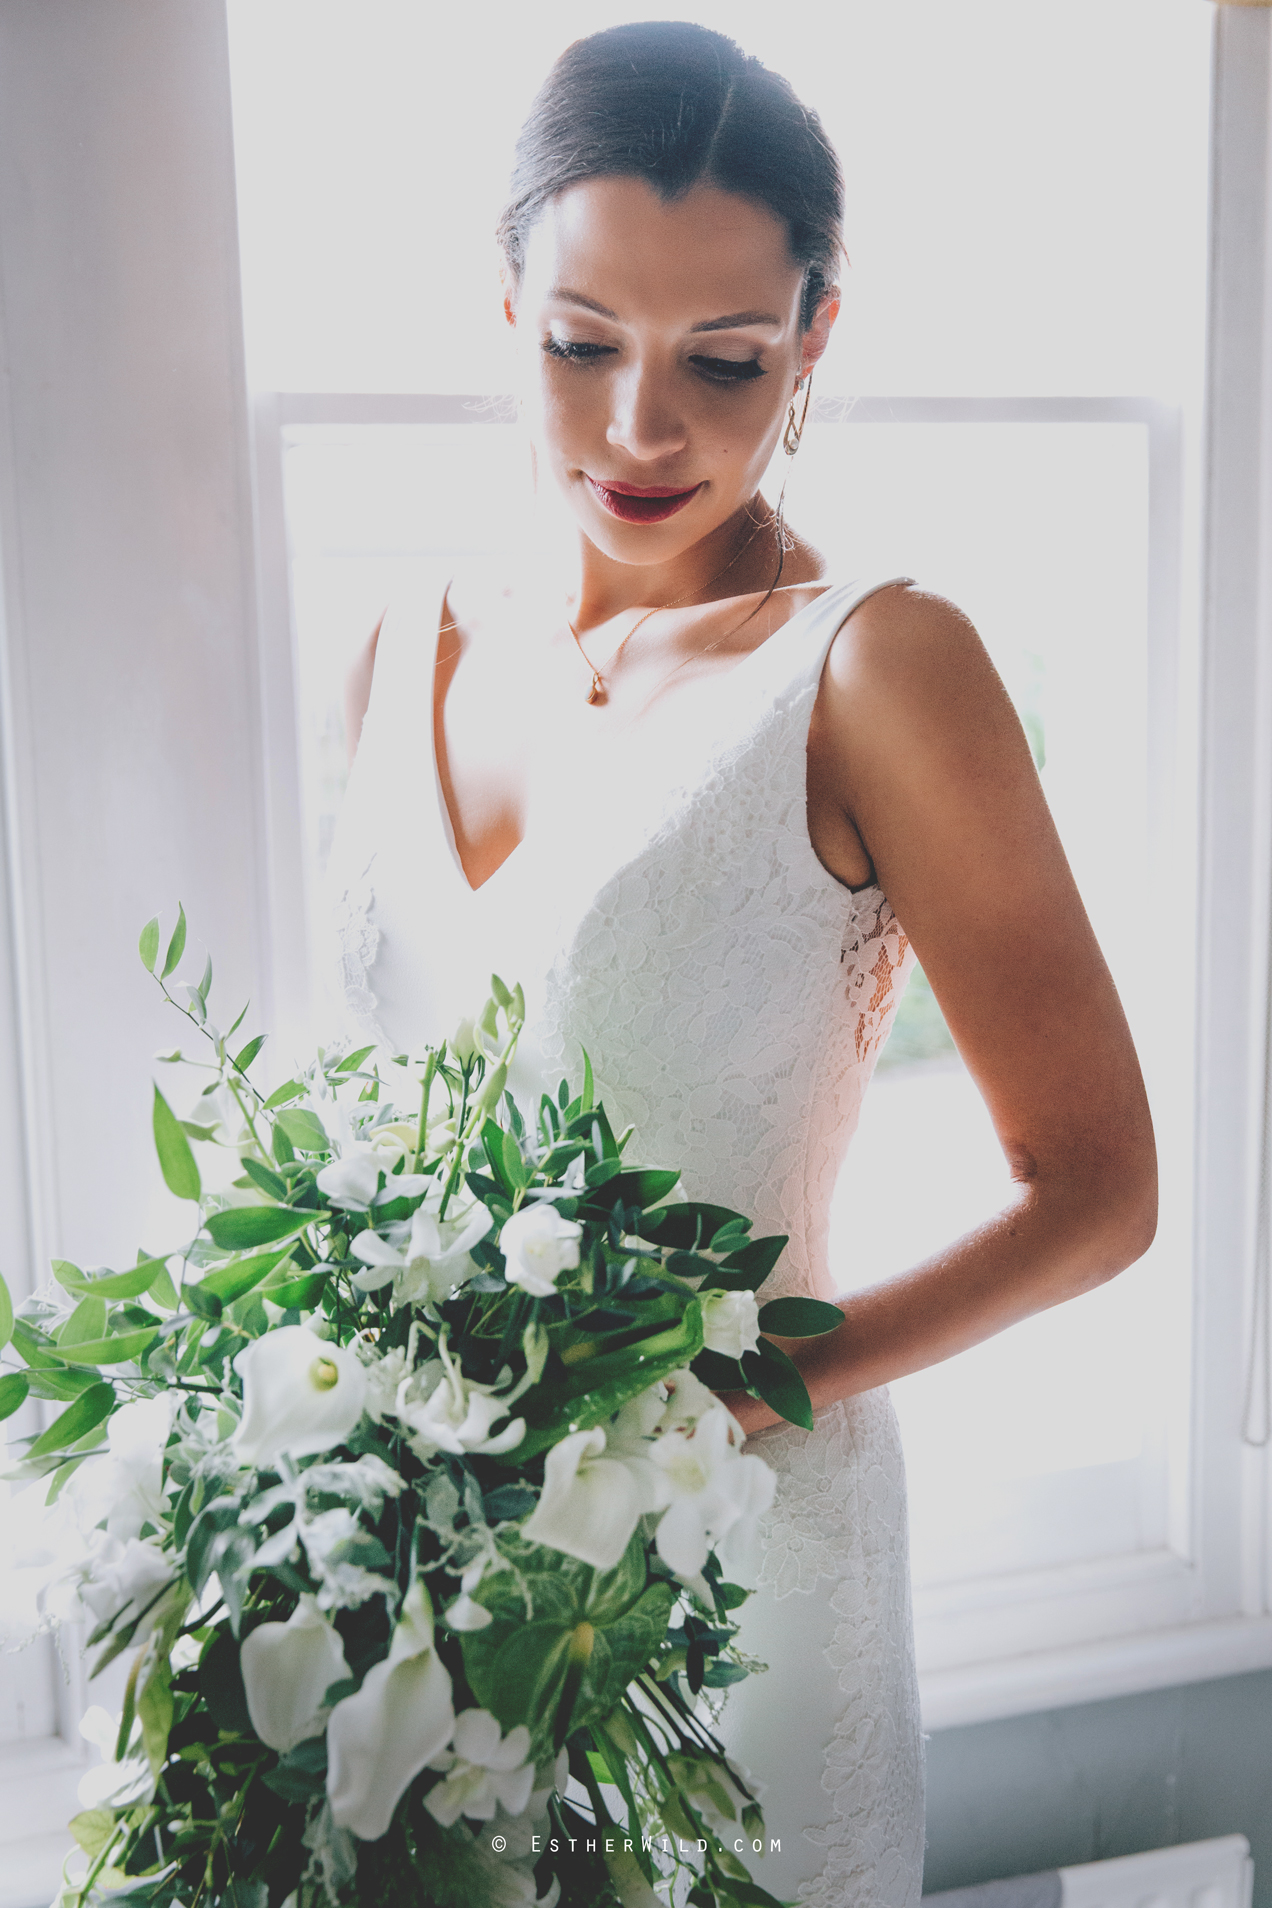 Islington_Town_Hall_Wedding_London_Photographer_Esther_Wild_IMG_4610.jpg